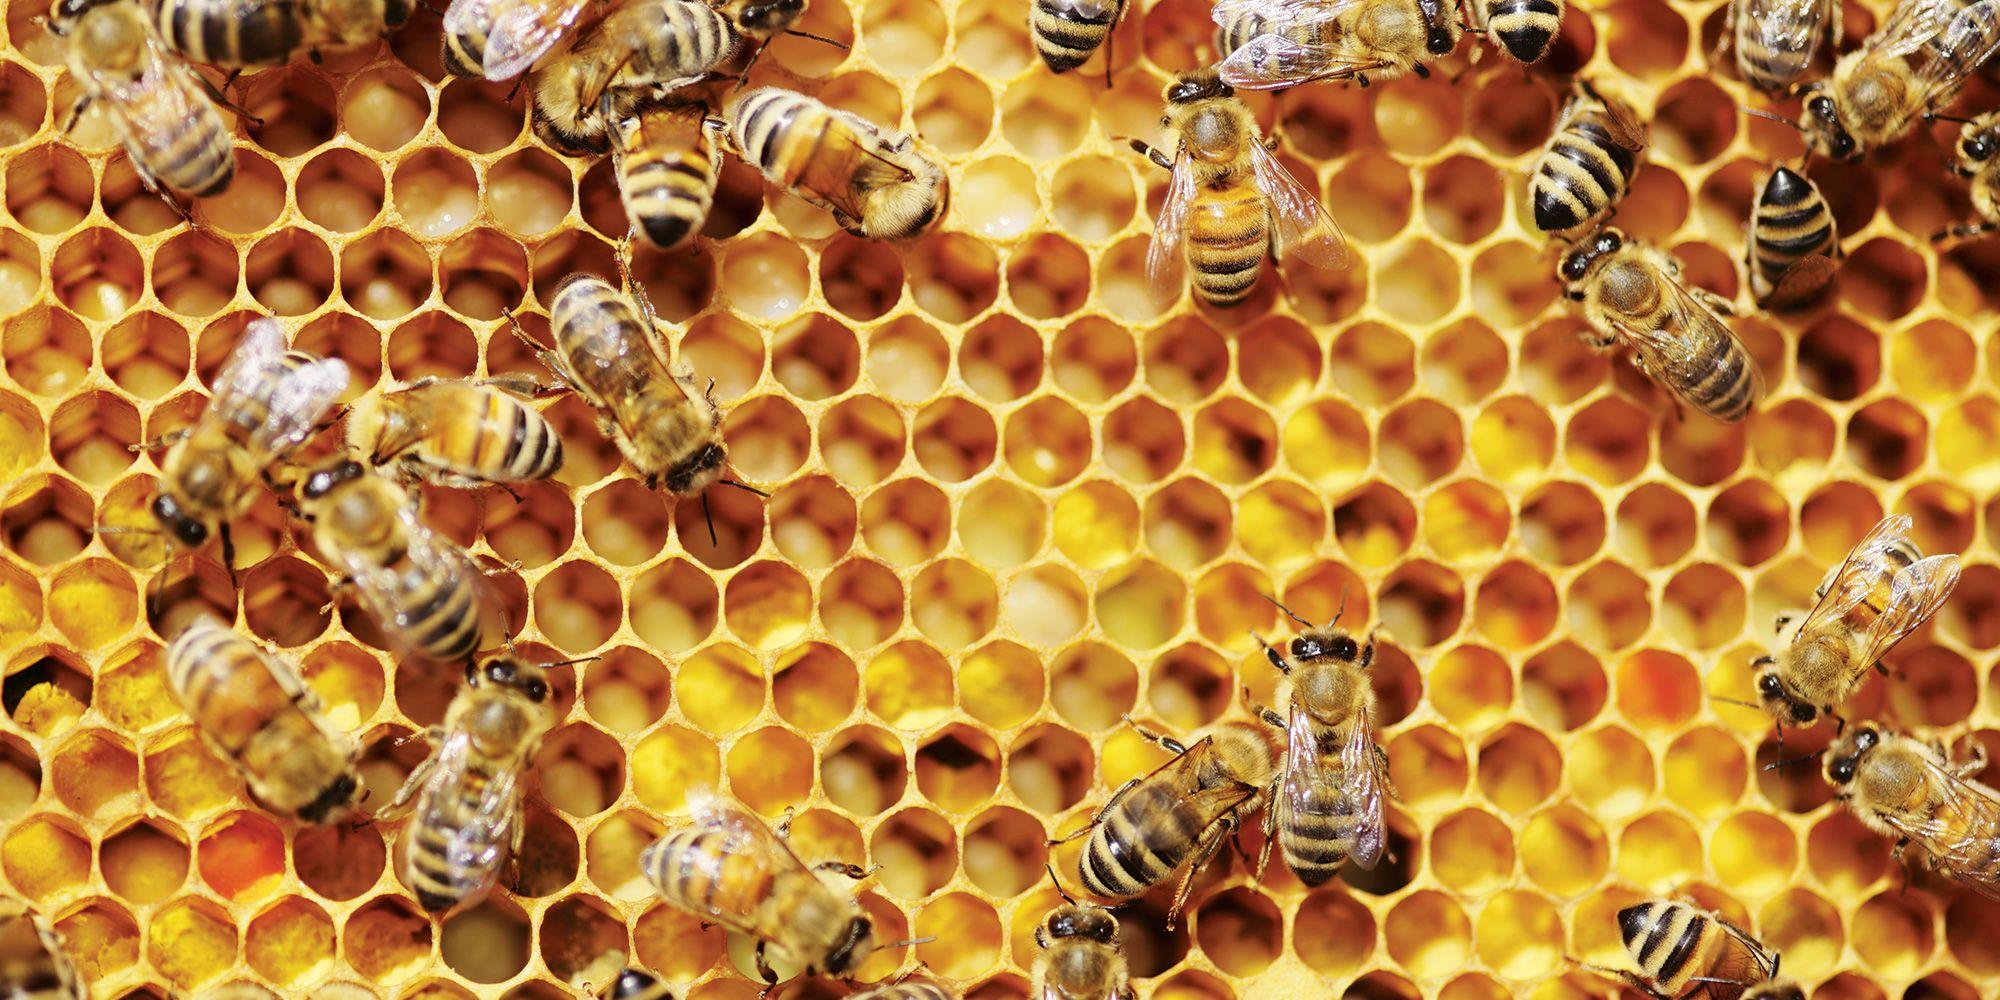 bees climbing honey comb